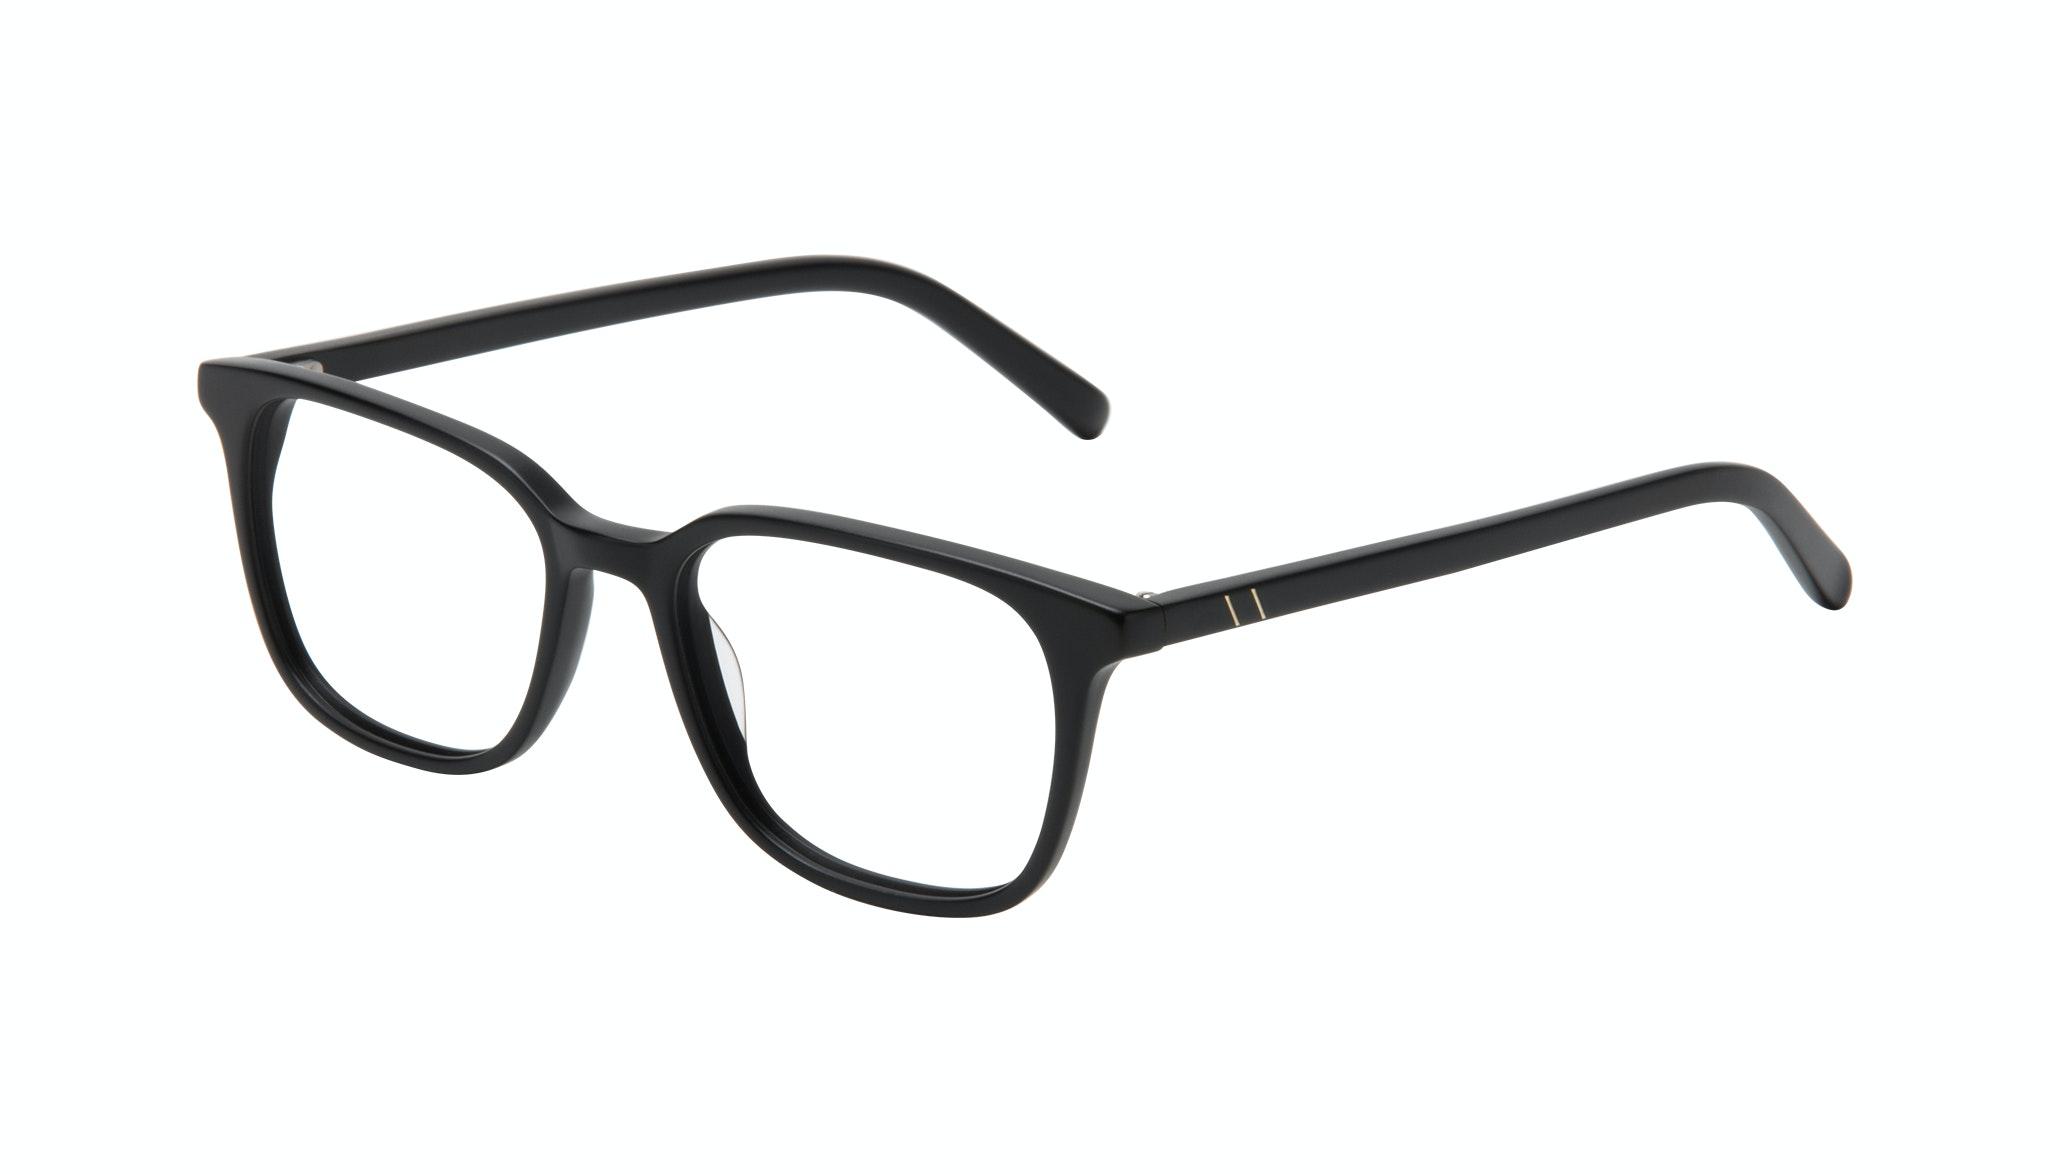 Affordable Fashion Glasses Square Eyeglasses Men Choice Black Matte Tilt